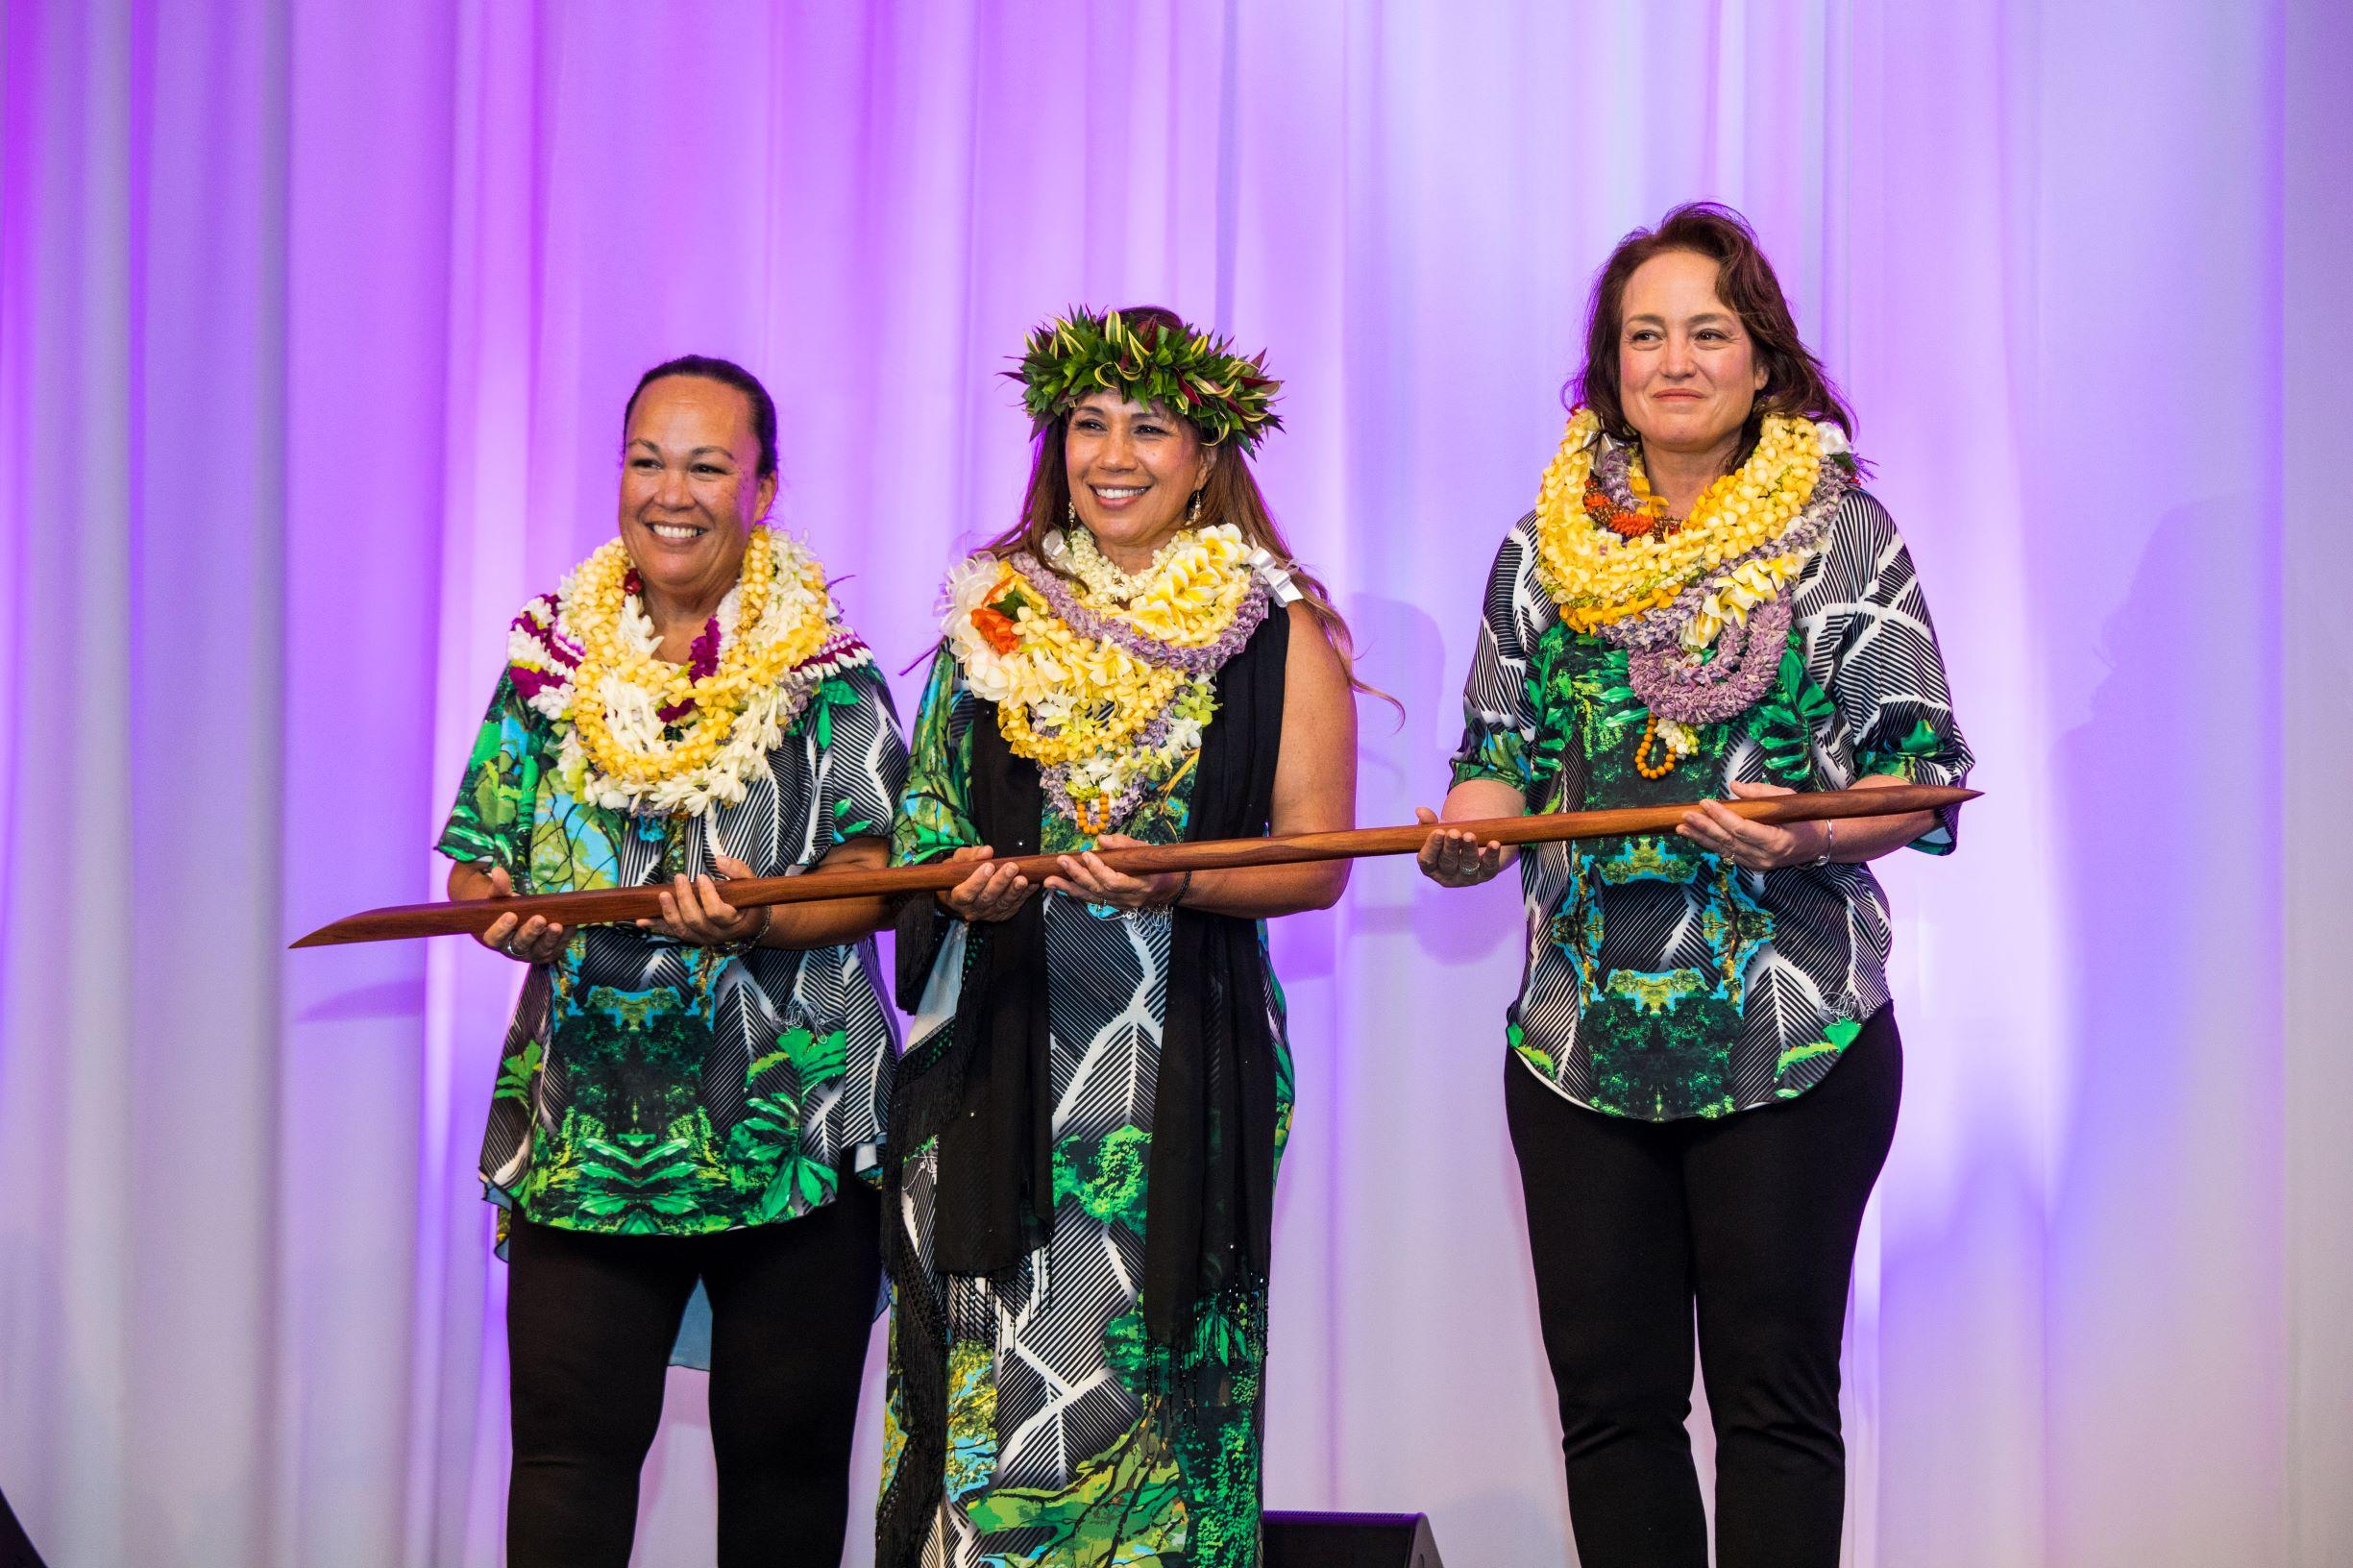 NLP_OʻO Awards_229FAV - SMALLER.JPG